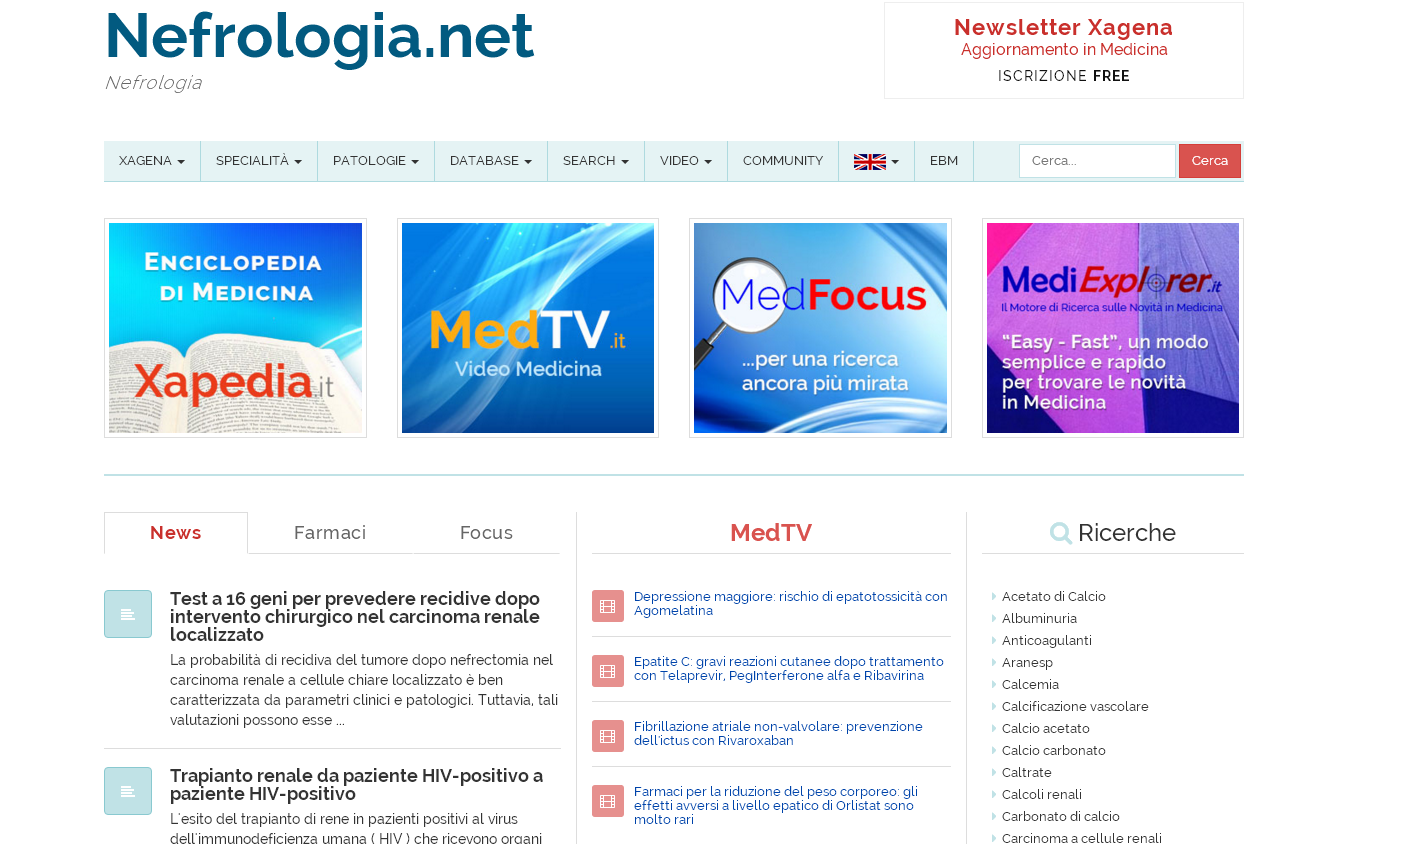 Nefrologia.net